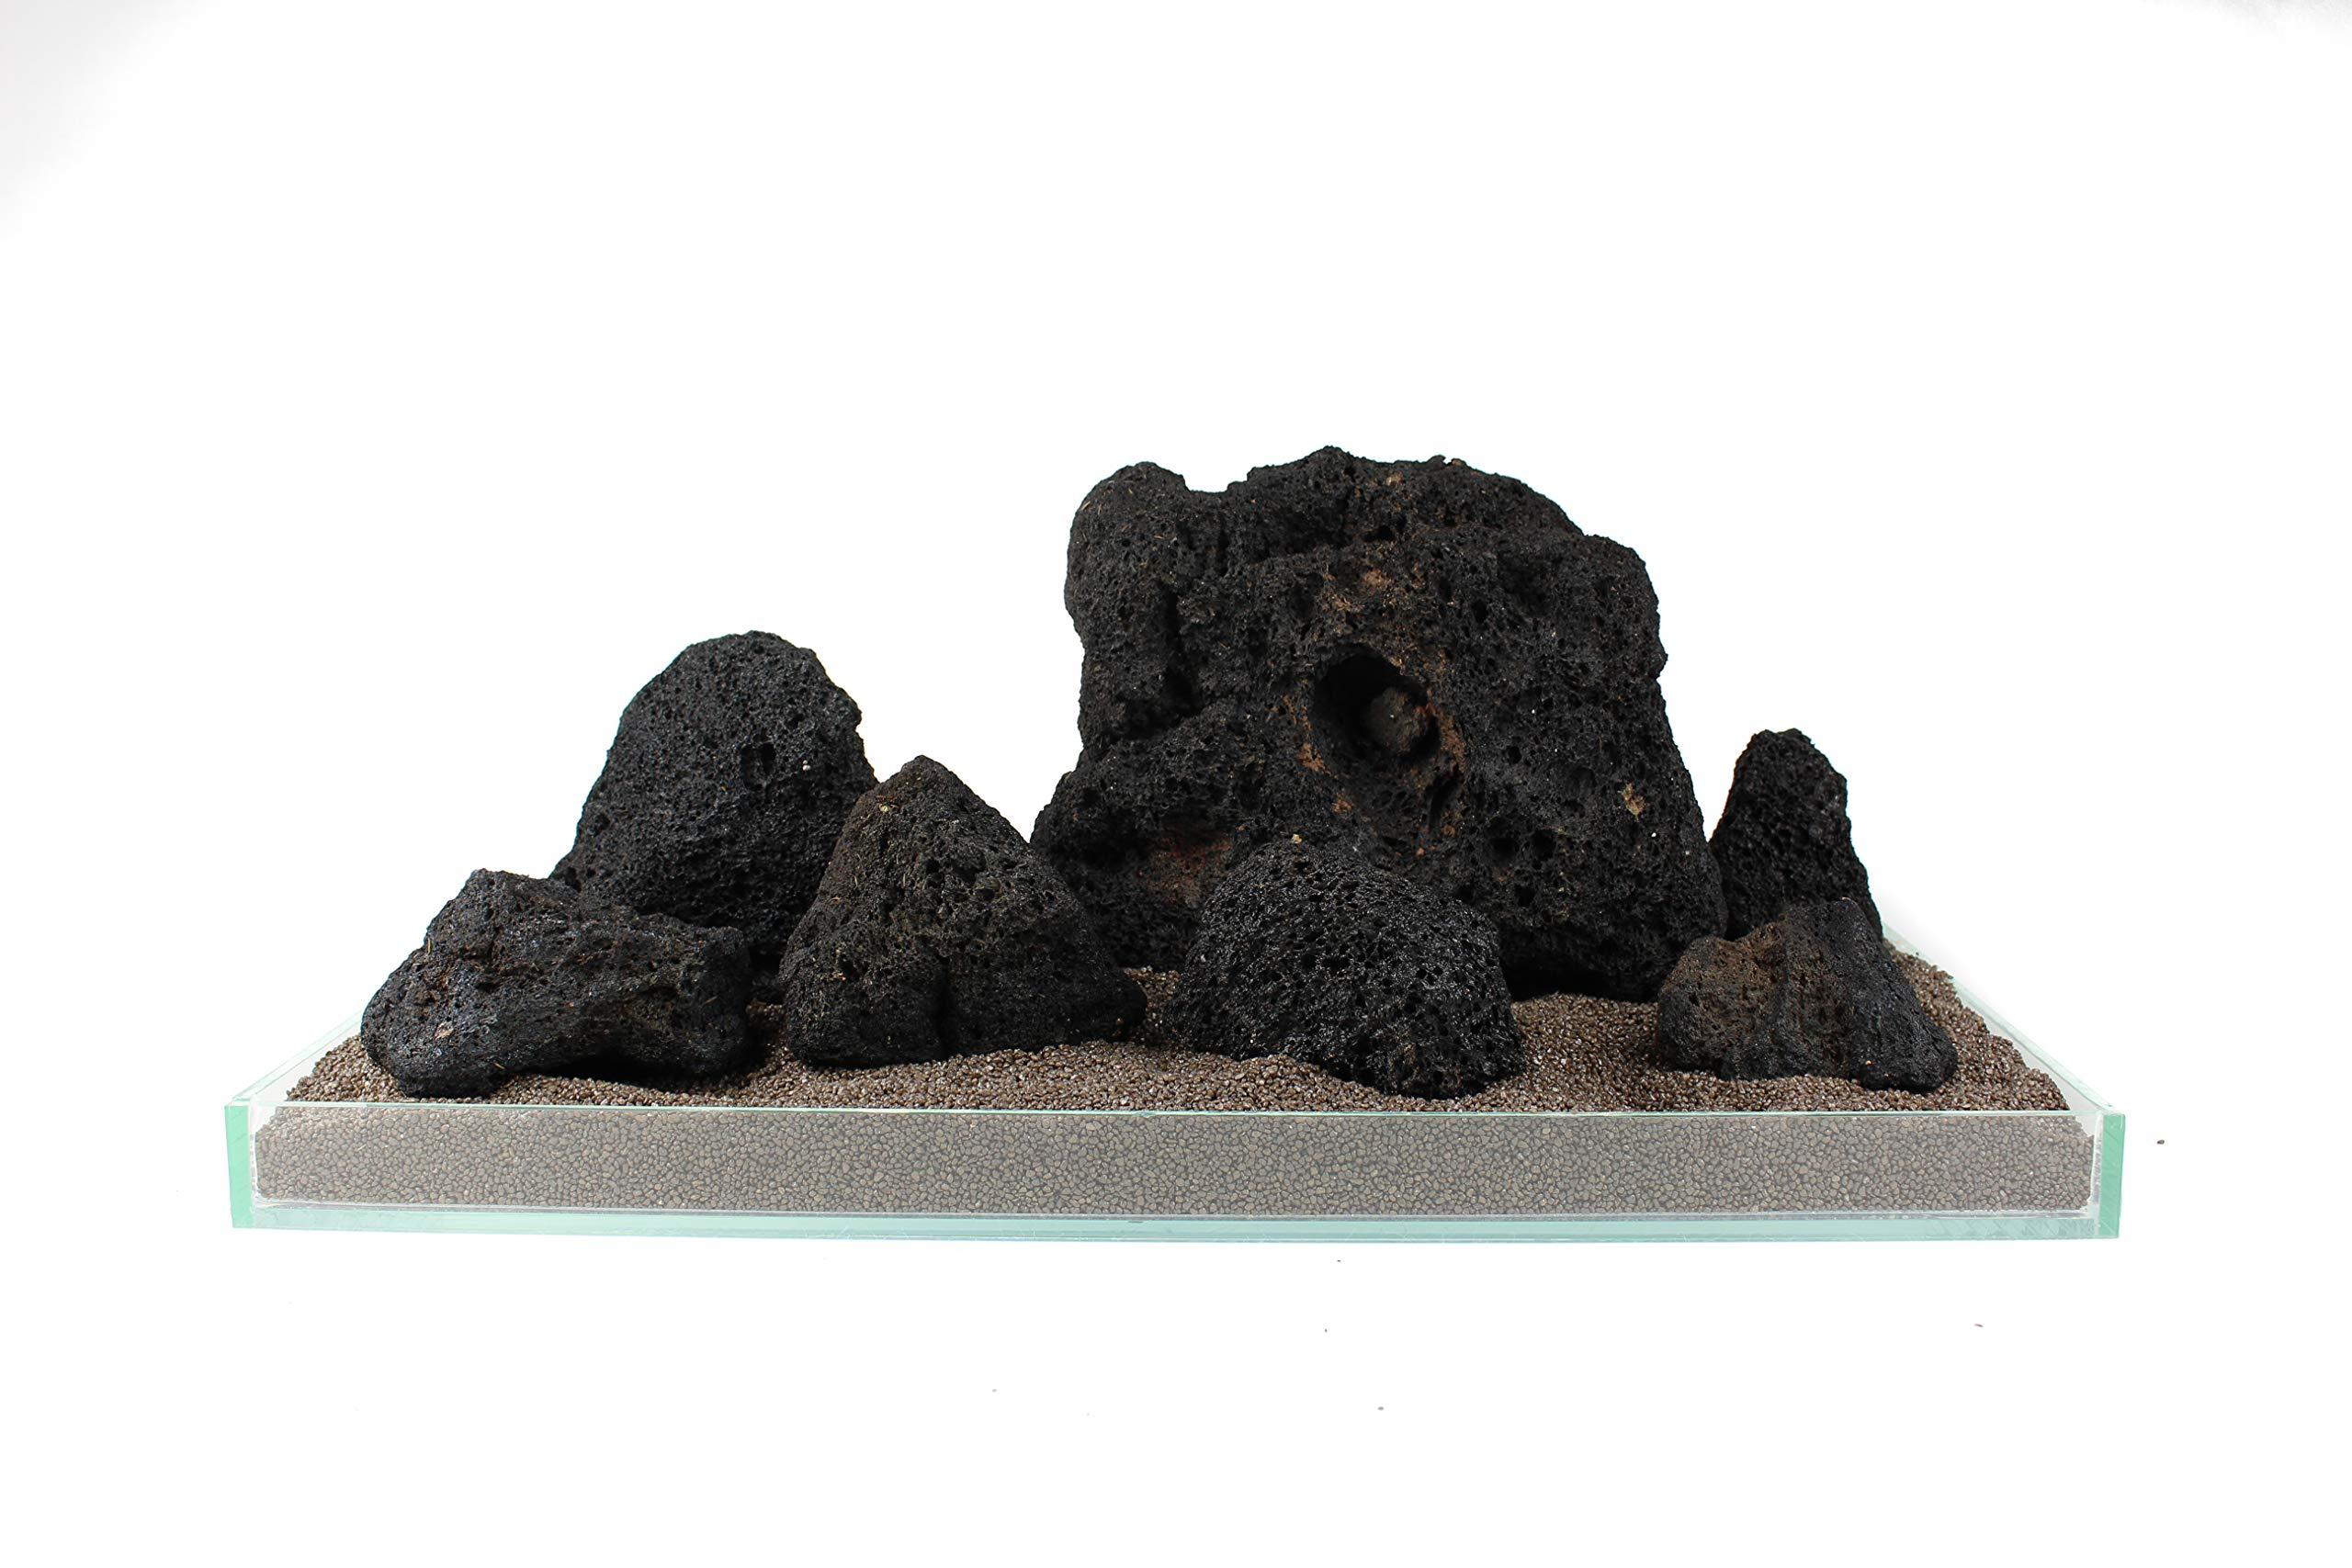 10kg Set Aquarium Stone Fish Tank Decoration Aquascaping Malawi Natural Black Volcanic Lava Rock